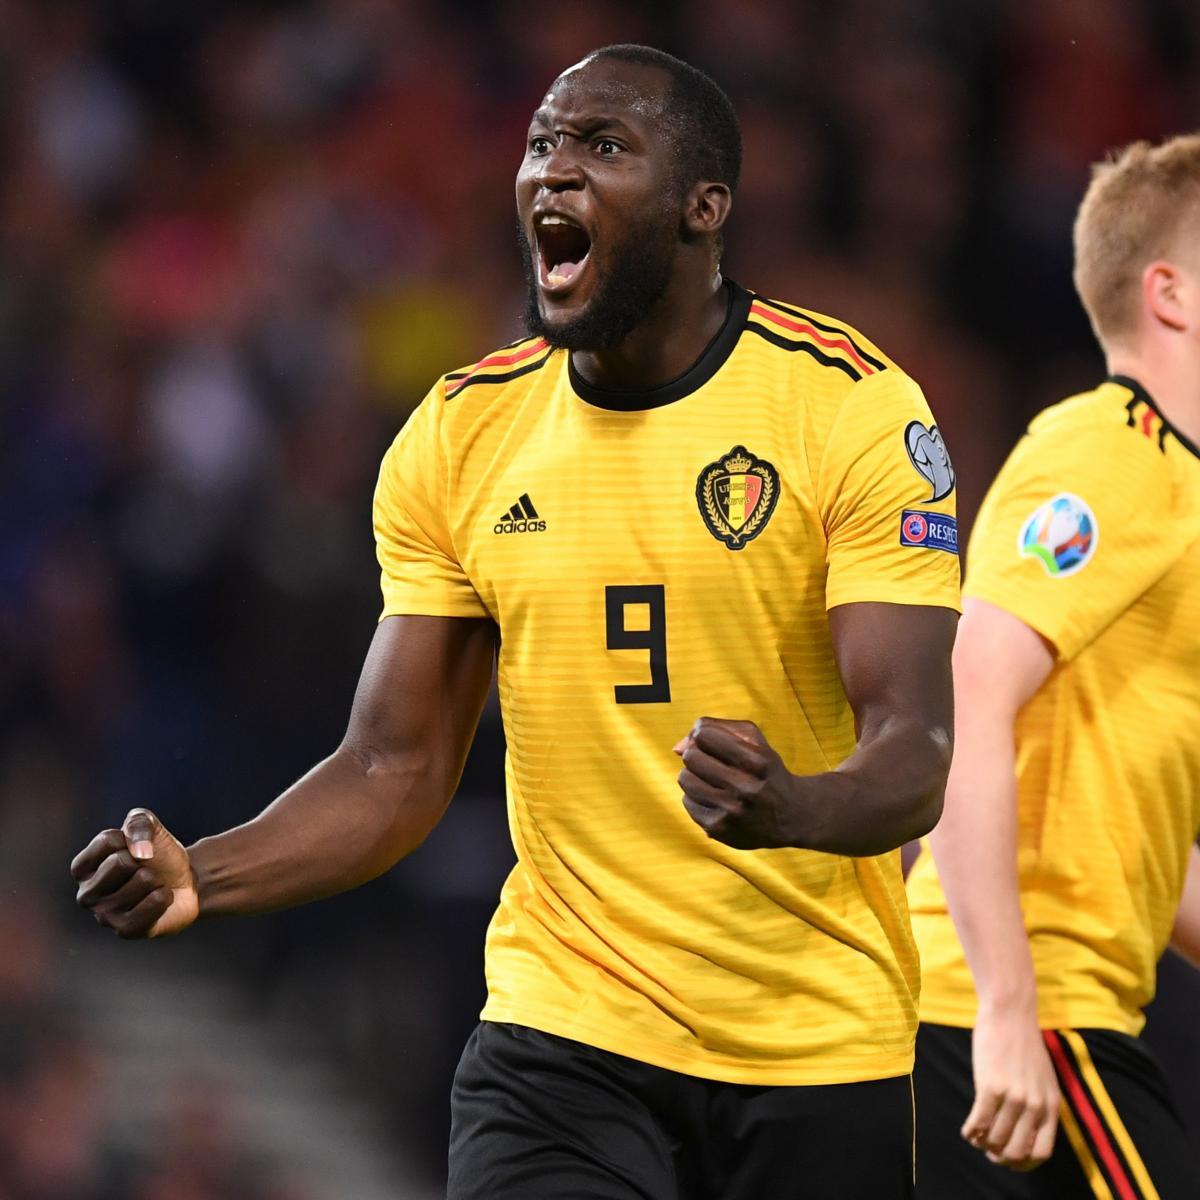 Romelu Lukaku Says He Is a 'Killer on the Field,' Eyes 50th Belgium Goal